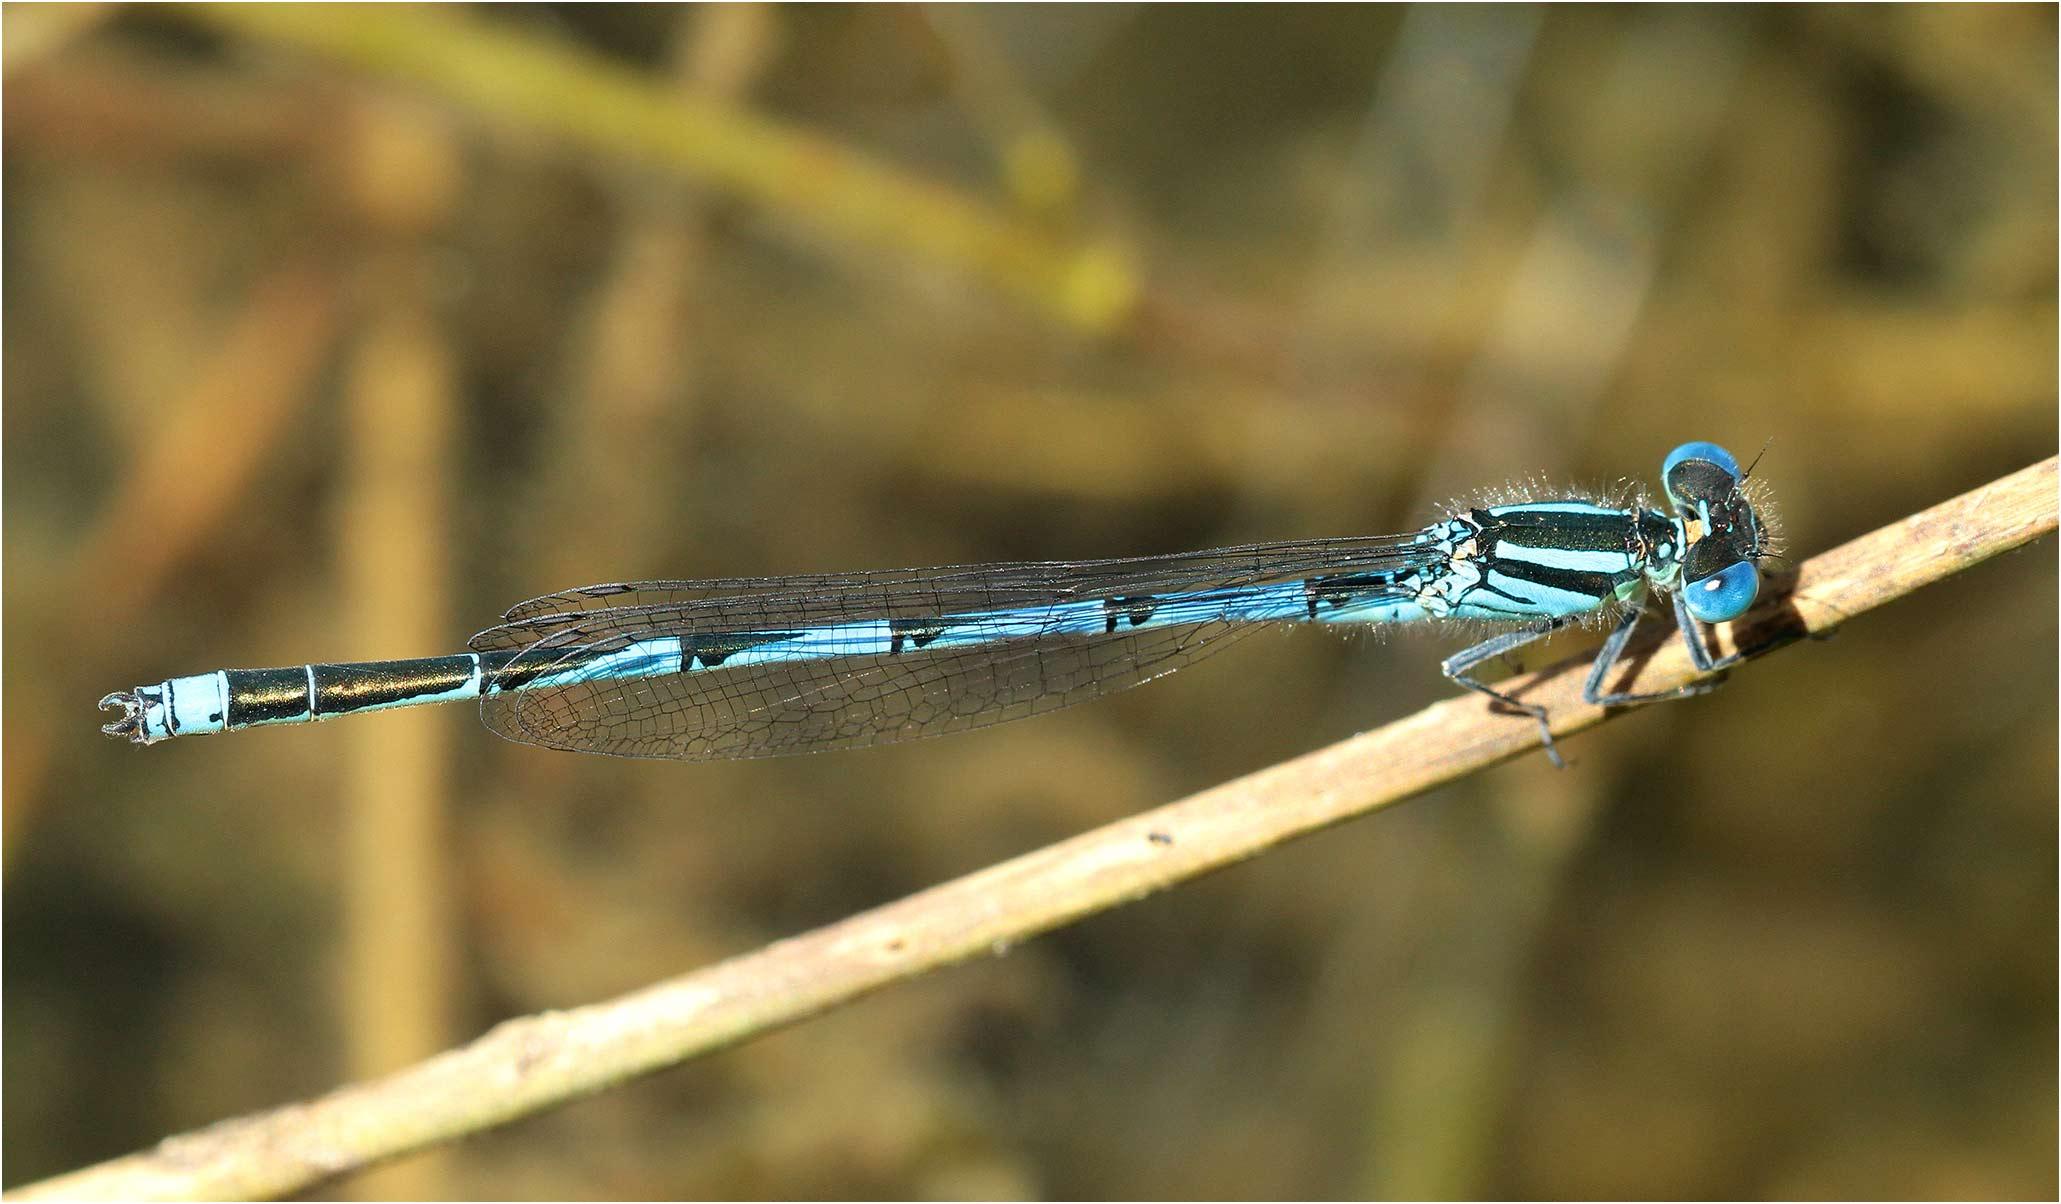 Erythromma lindenii mâle, France, Saint Rémy en Mauges, 12/06/2014